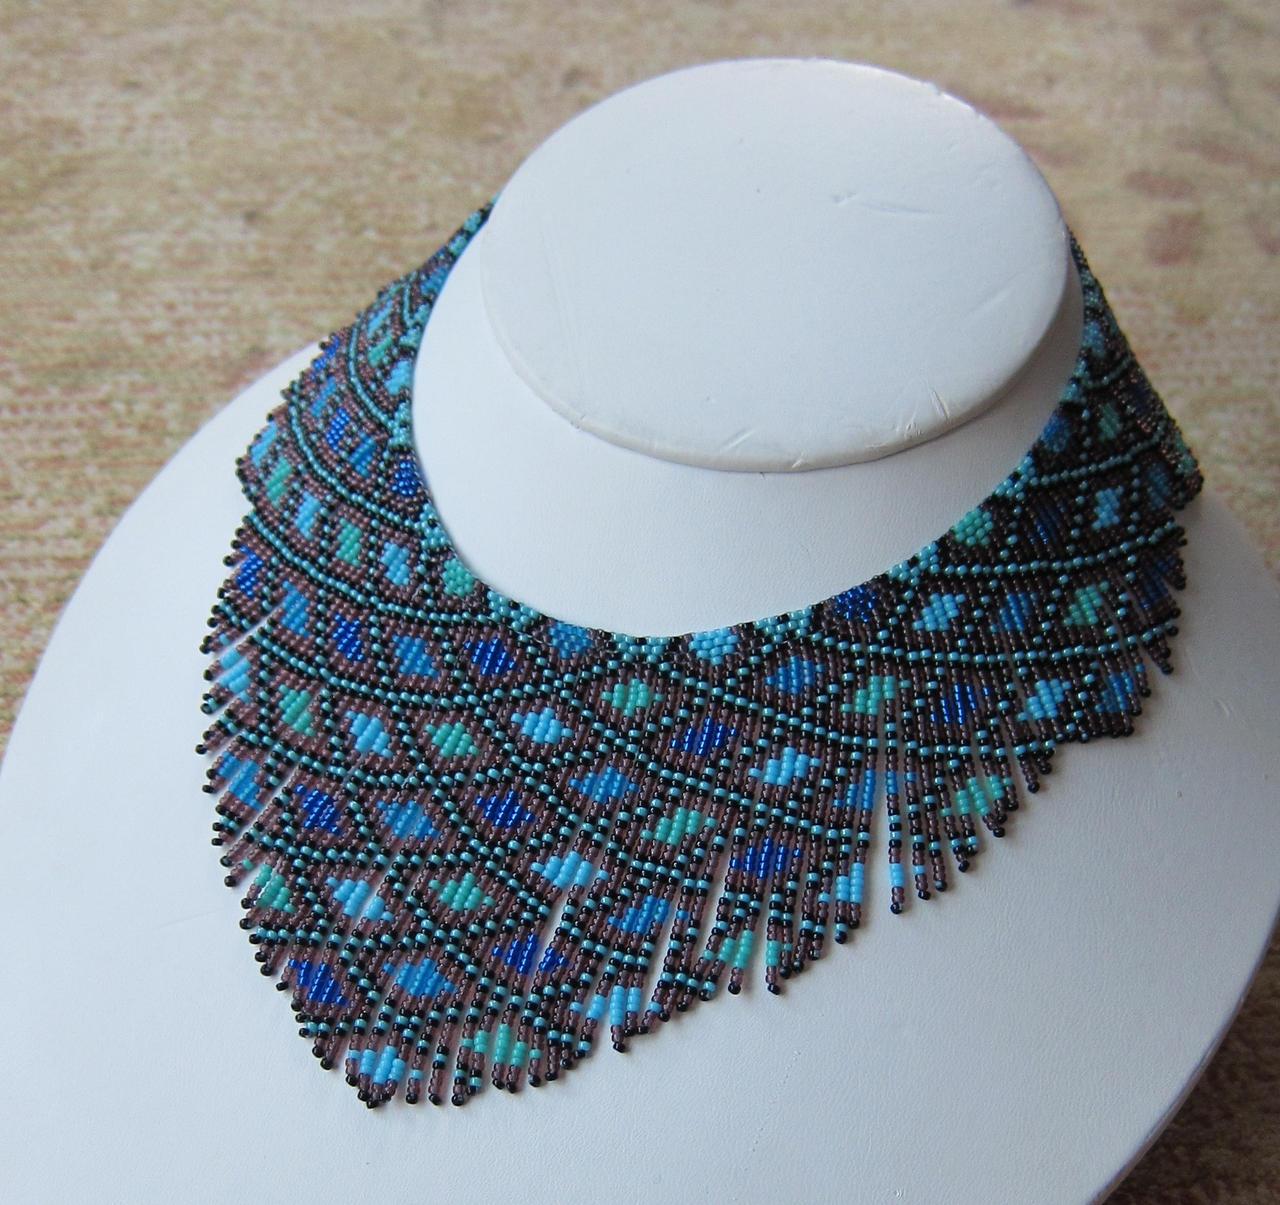 Helmineitsyt 1.2 seed bead necklace by AxmxZ on DeviantArt